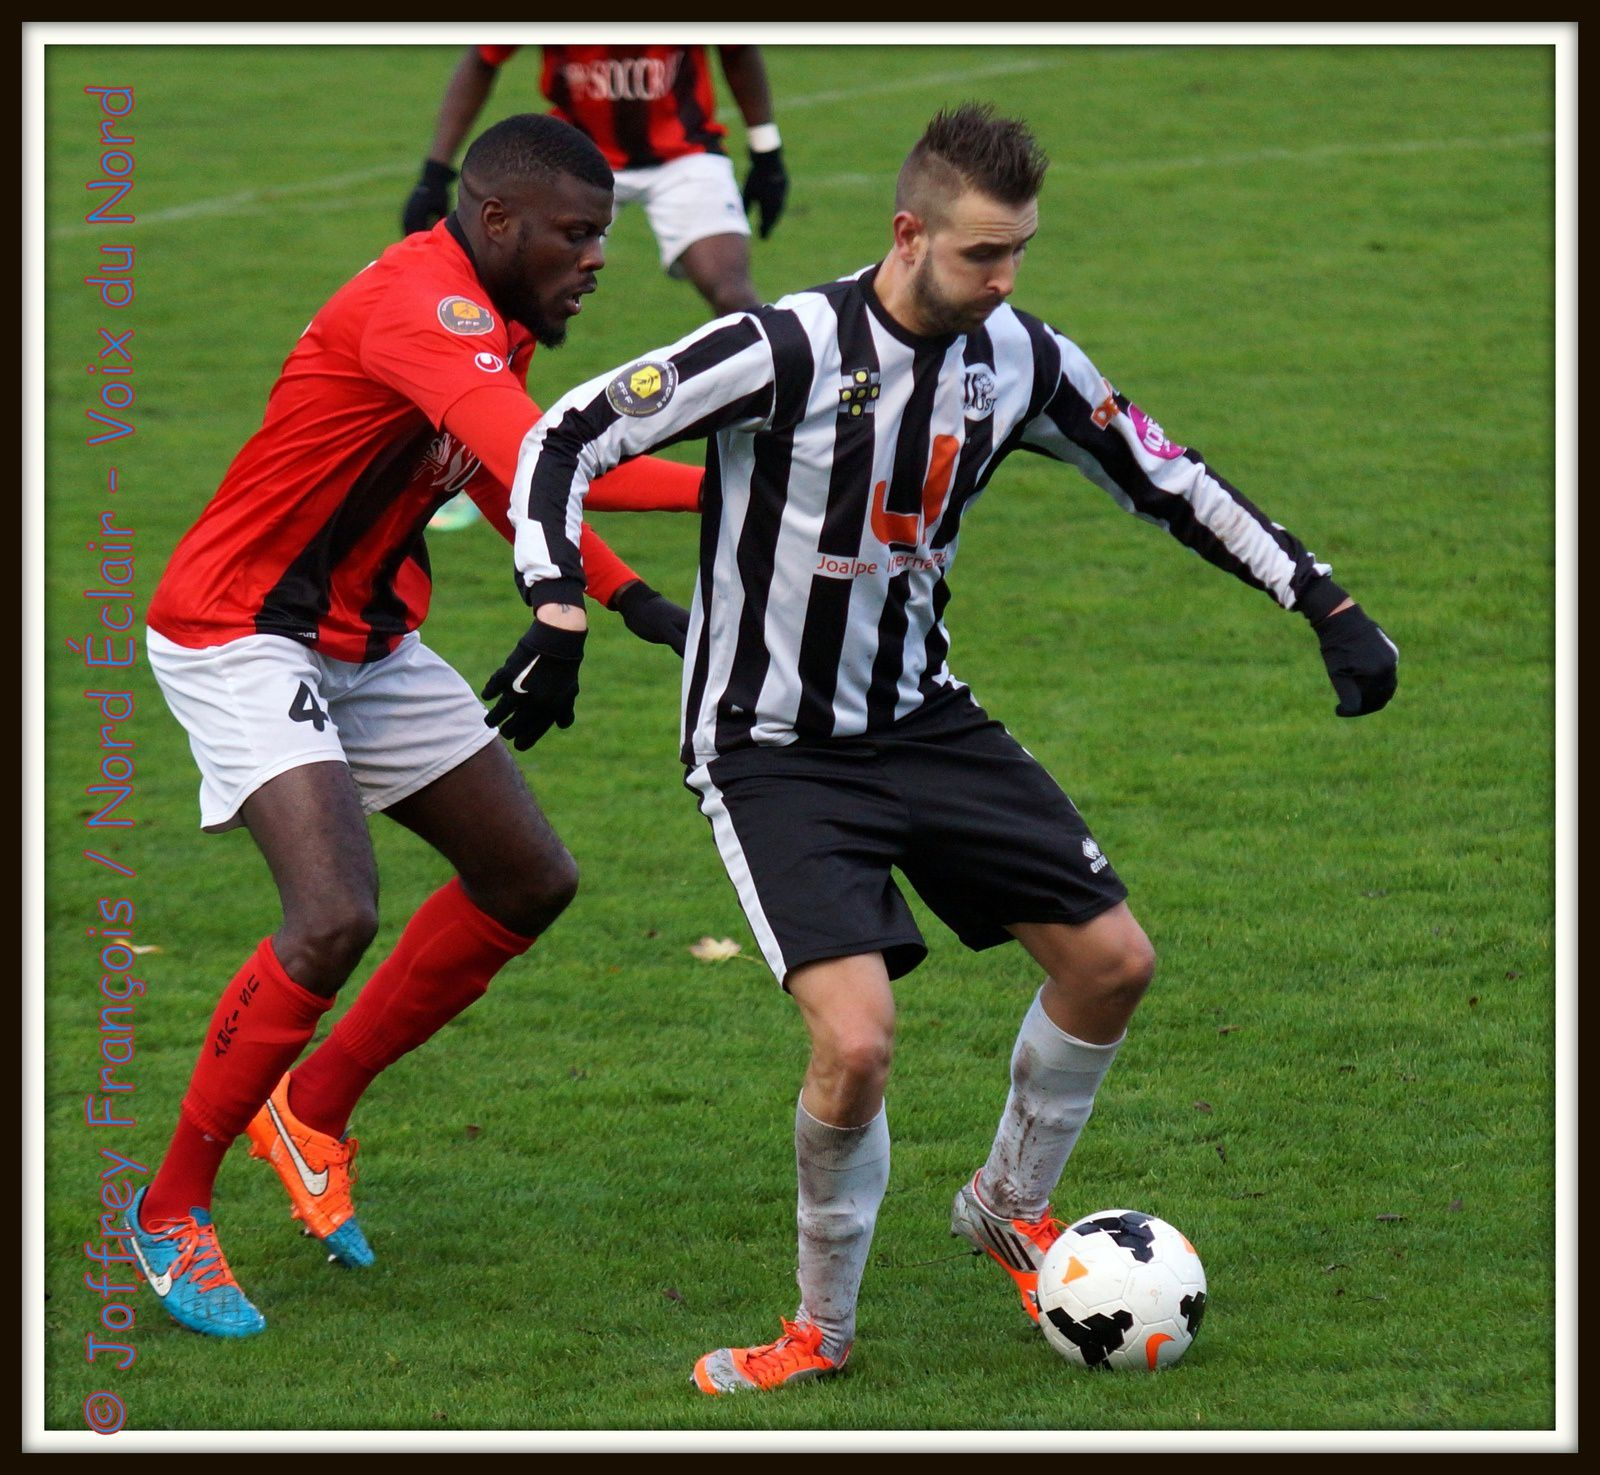 22.11.15 CFA 2 Tourcoing - Ivry